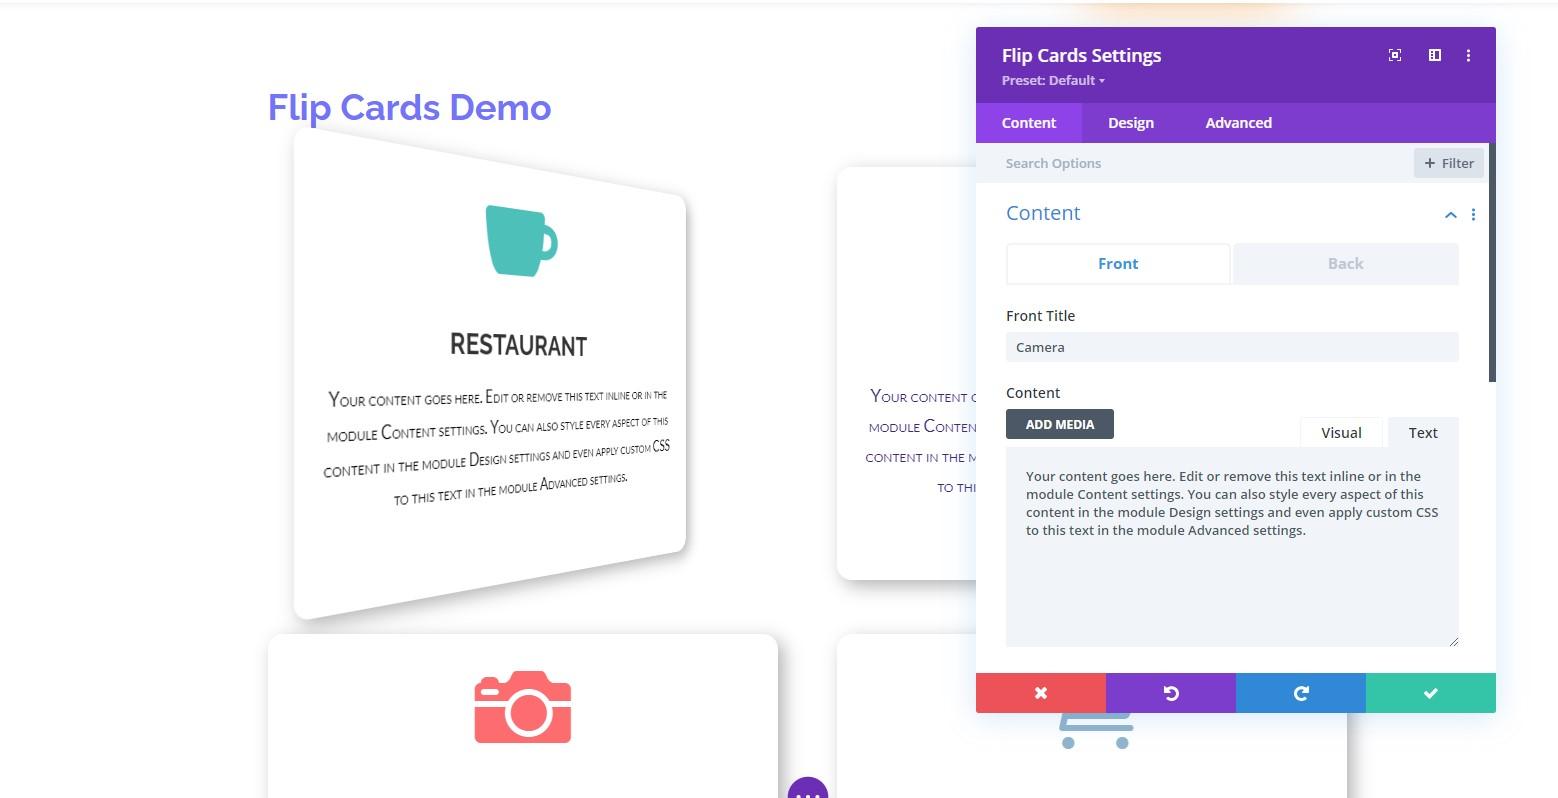 Flip Card Settings Visual Builder